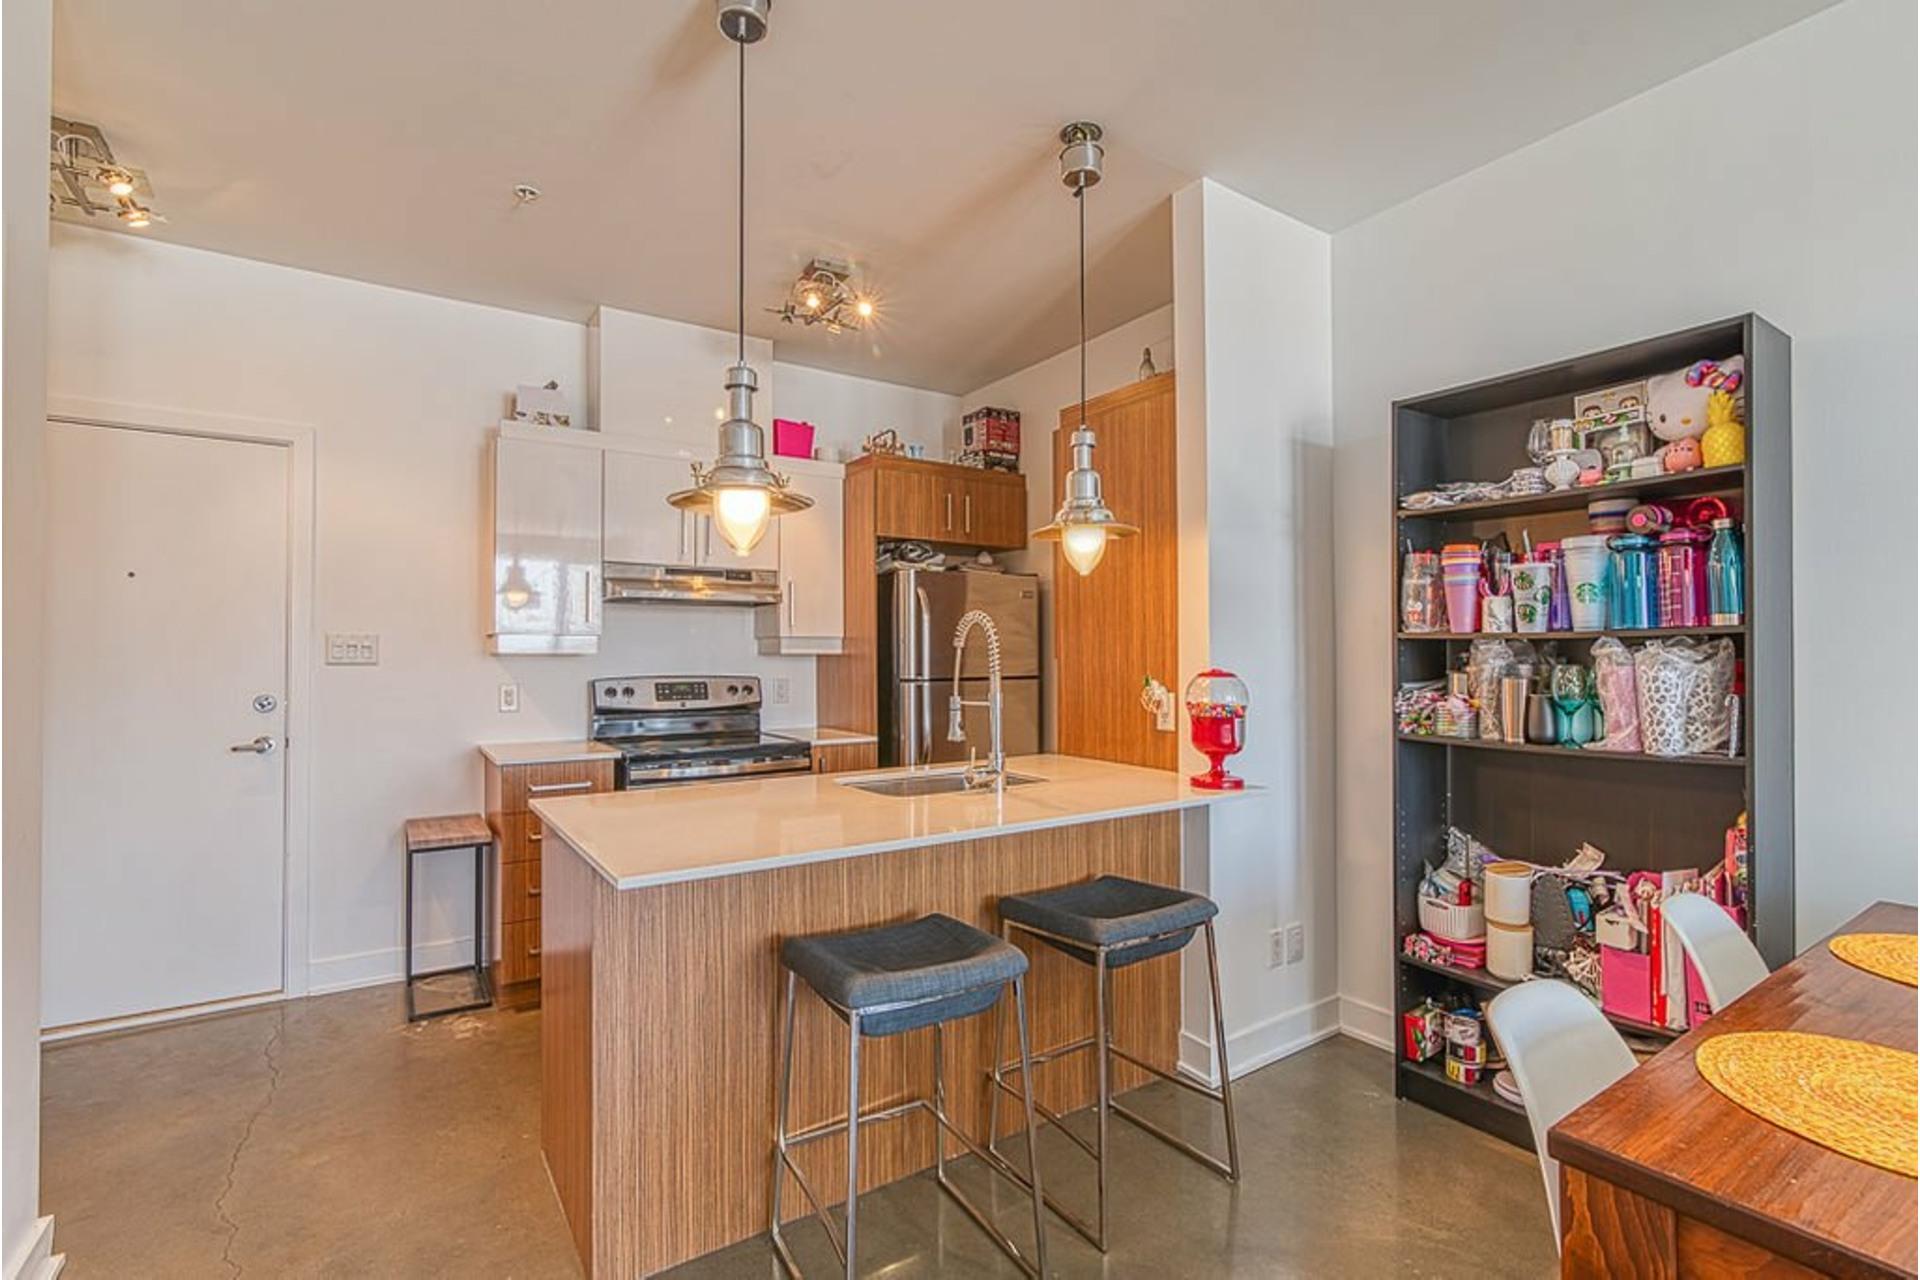 image 10 - Apartment For sale Blainville - 4 rooms